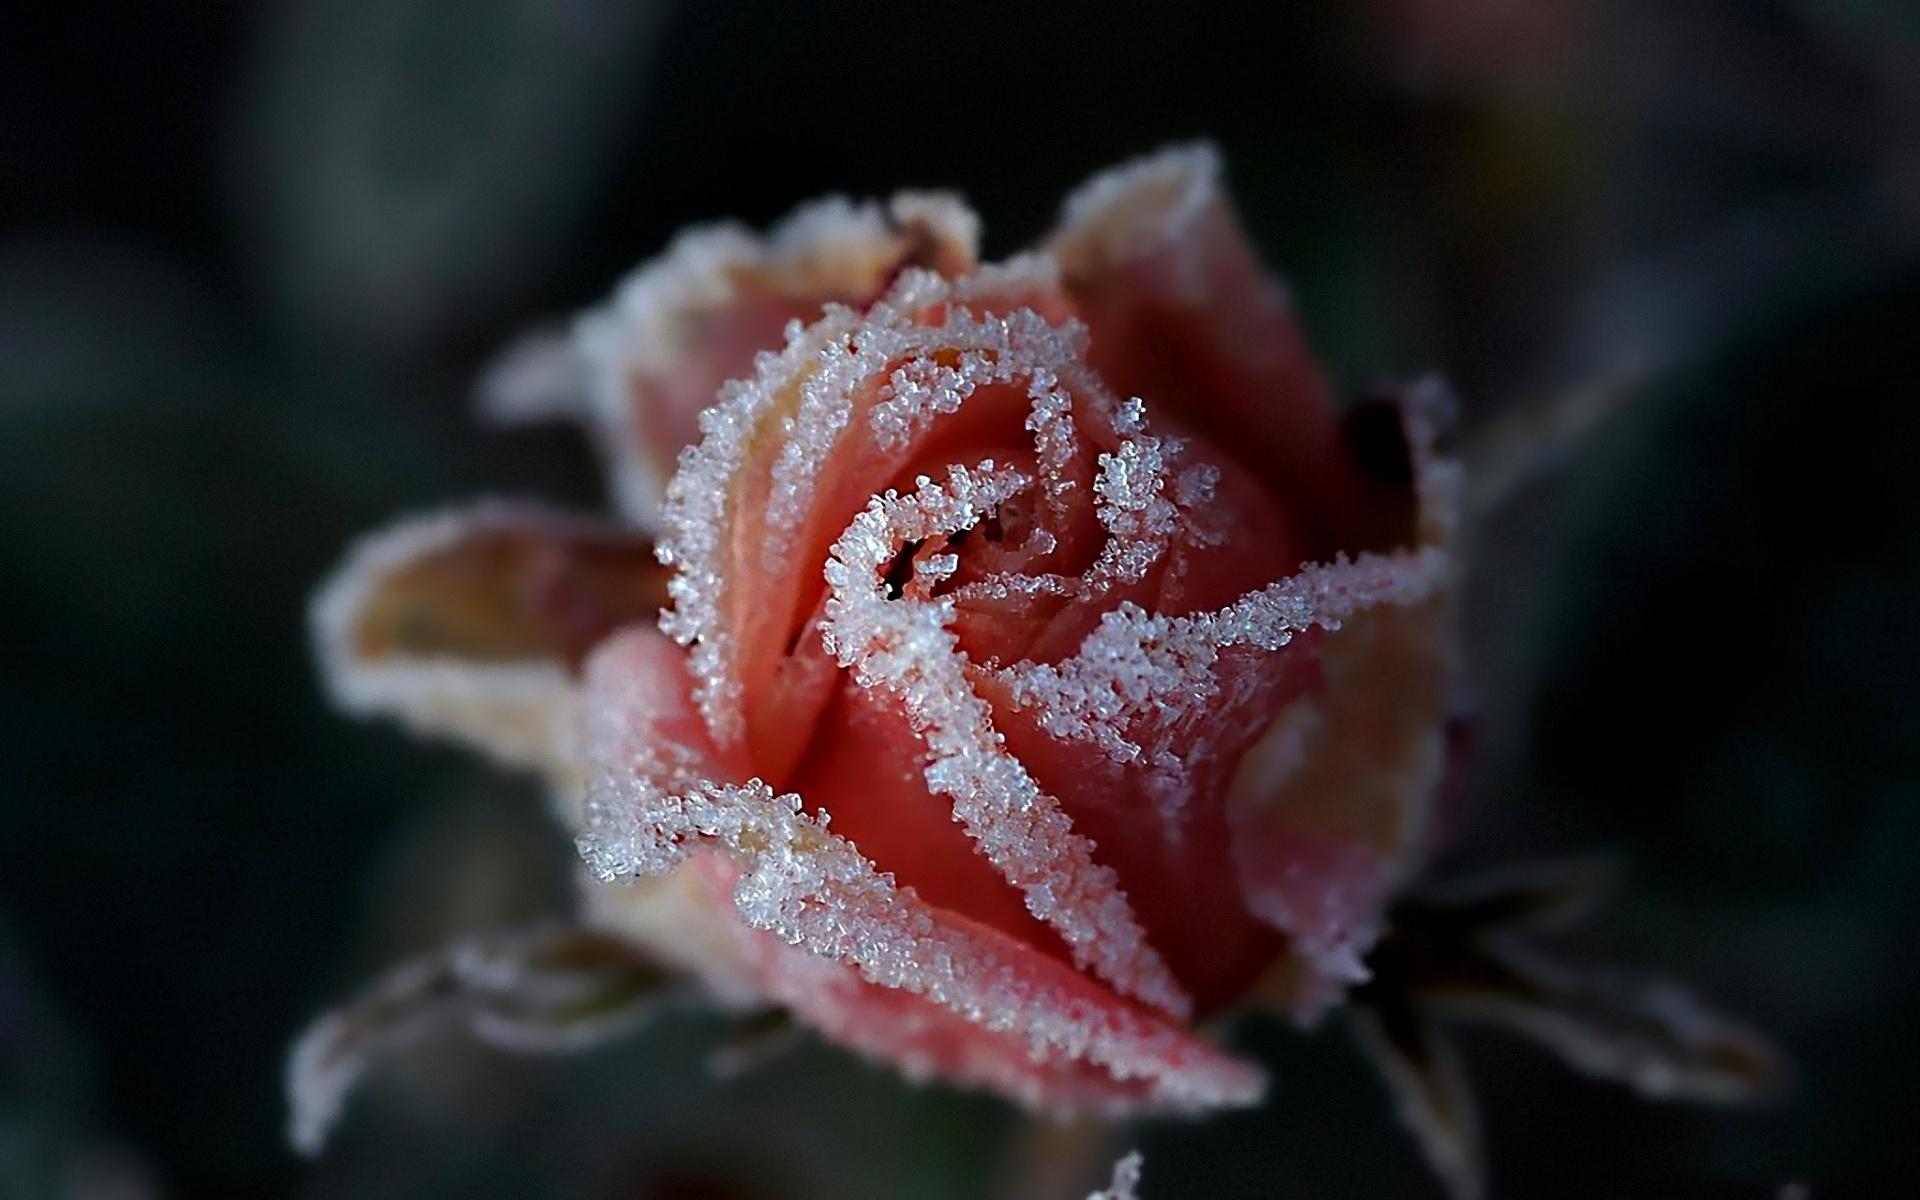 Snow rose flower wallpapers 1920x1200 556602 - Rose in snow wallpaper ...